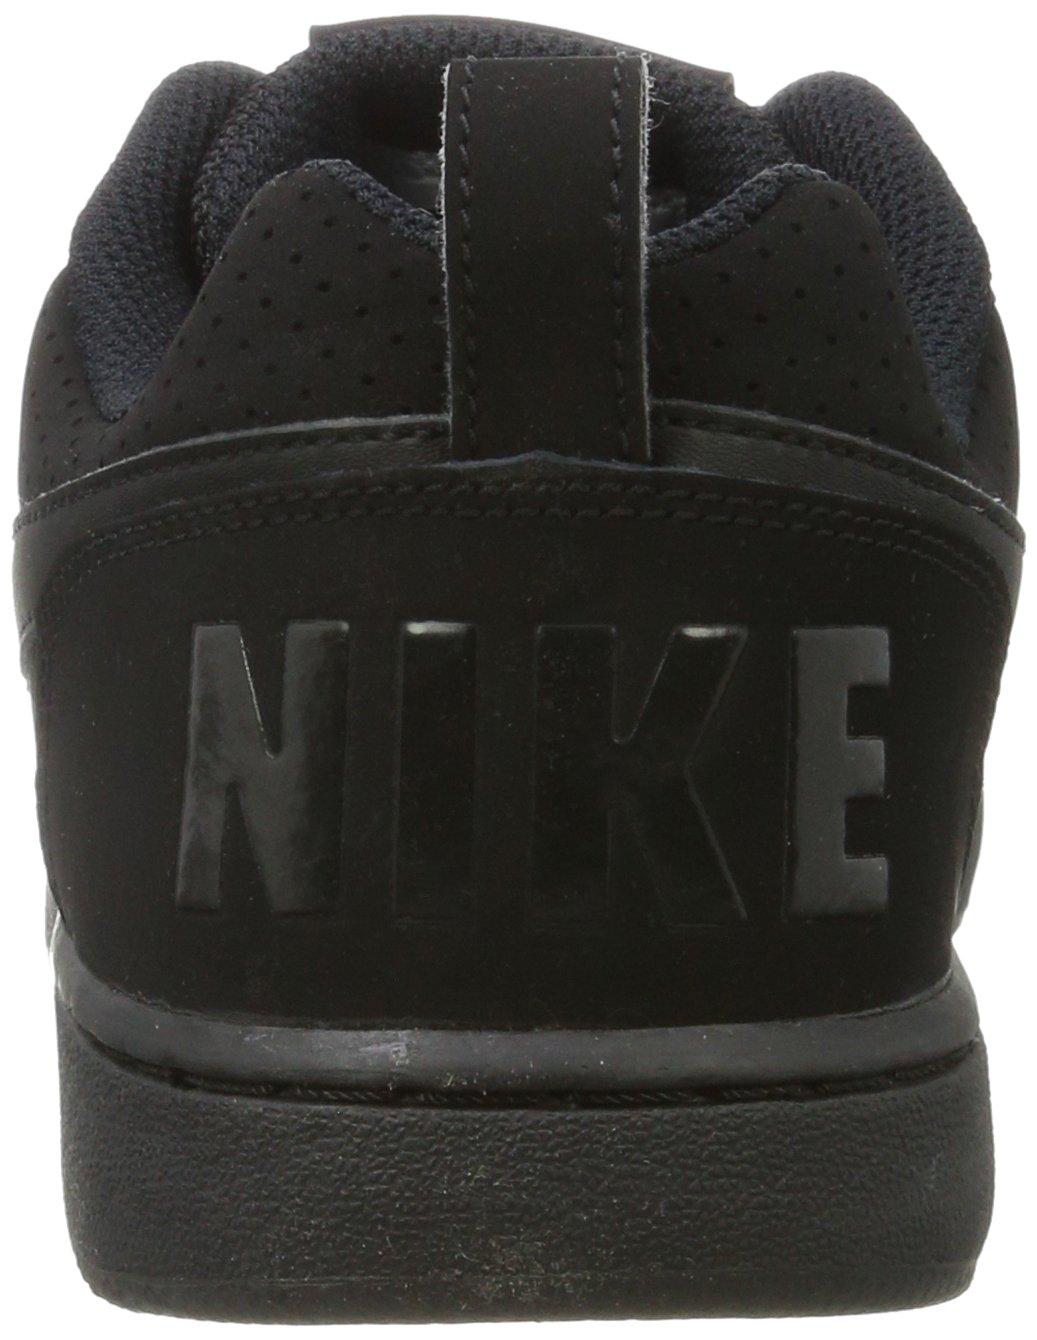 Nike Borough Mens Court Low Basketball Shoe B013vnxb4y Clarette Wedges Cyra Brown 105 Dm Us